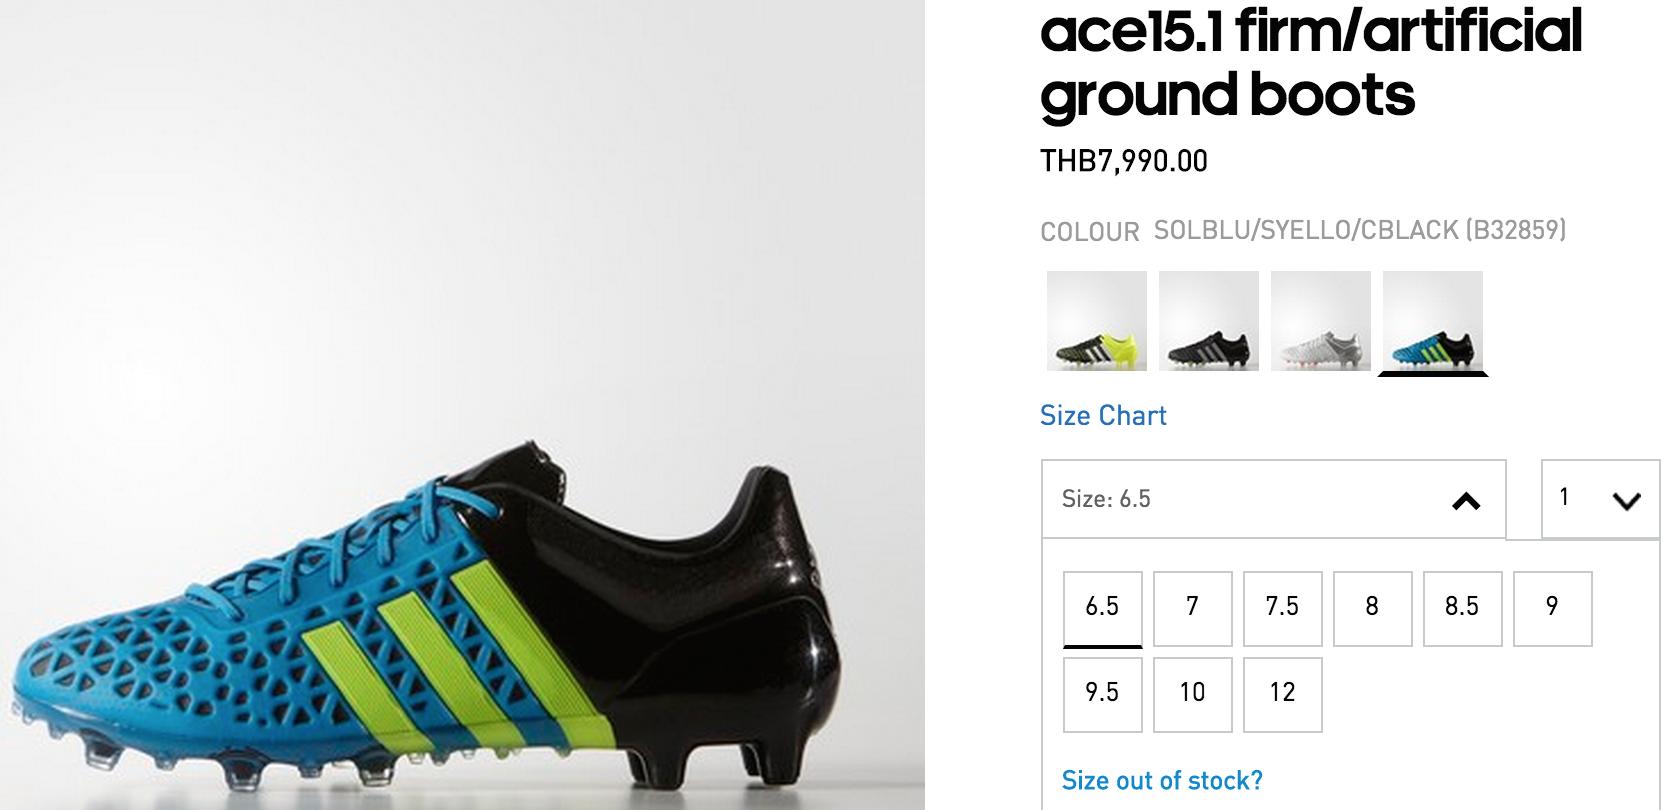 Shop adidas Uk รองเท้าในเวปไซด์ Size Us หรือ qxnPpoRw75th เป็นแบบ 5PEWzcwq